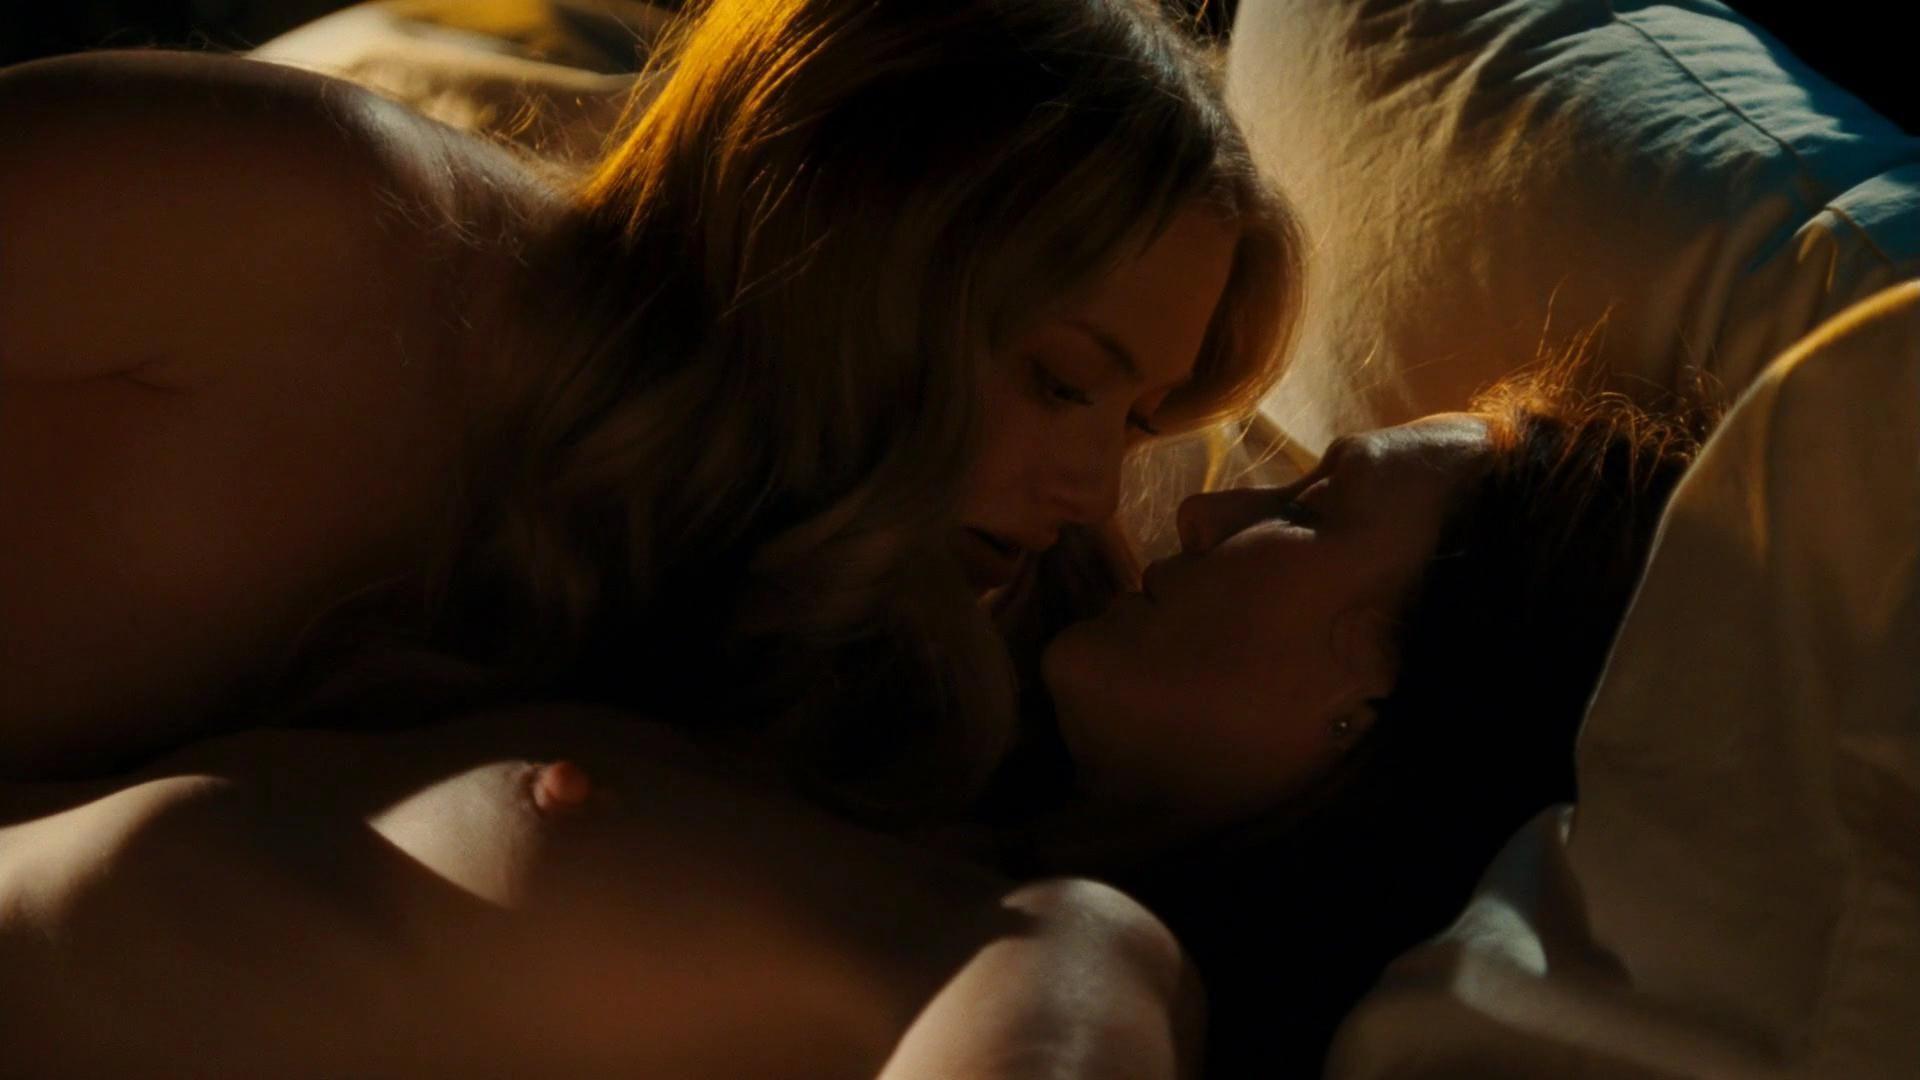 lesbian-erotic-films